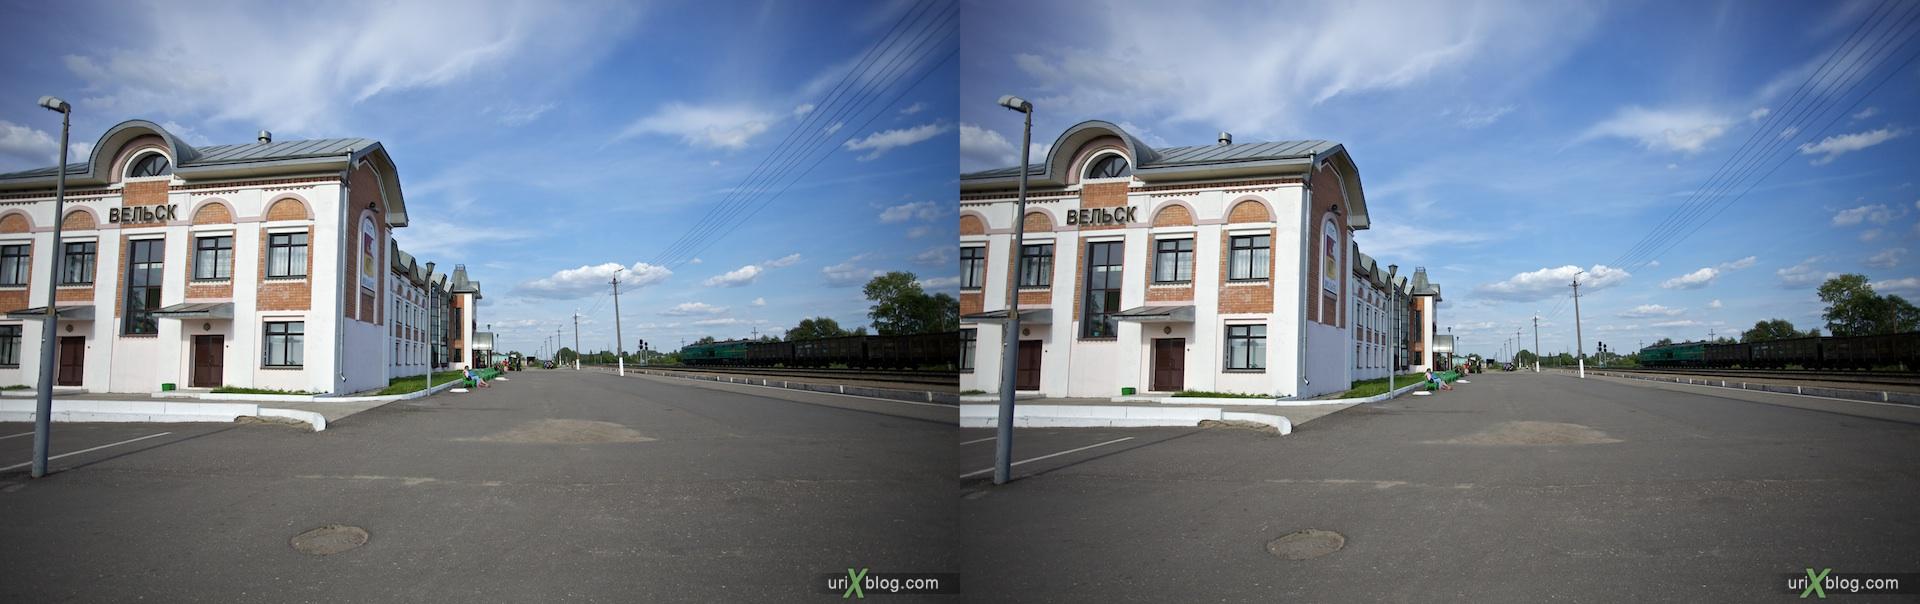 2010 Velsk, Arkhangelsk Oblast Вельск, Архангельская обл